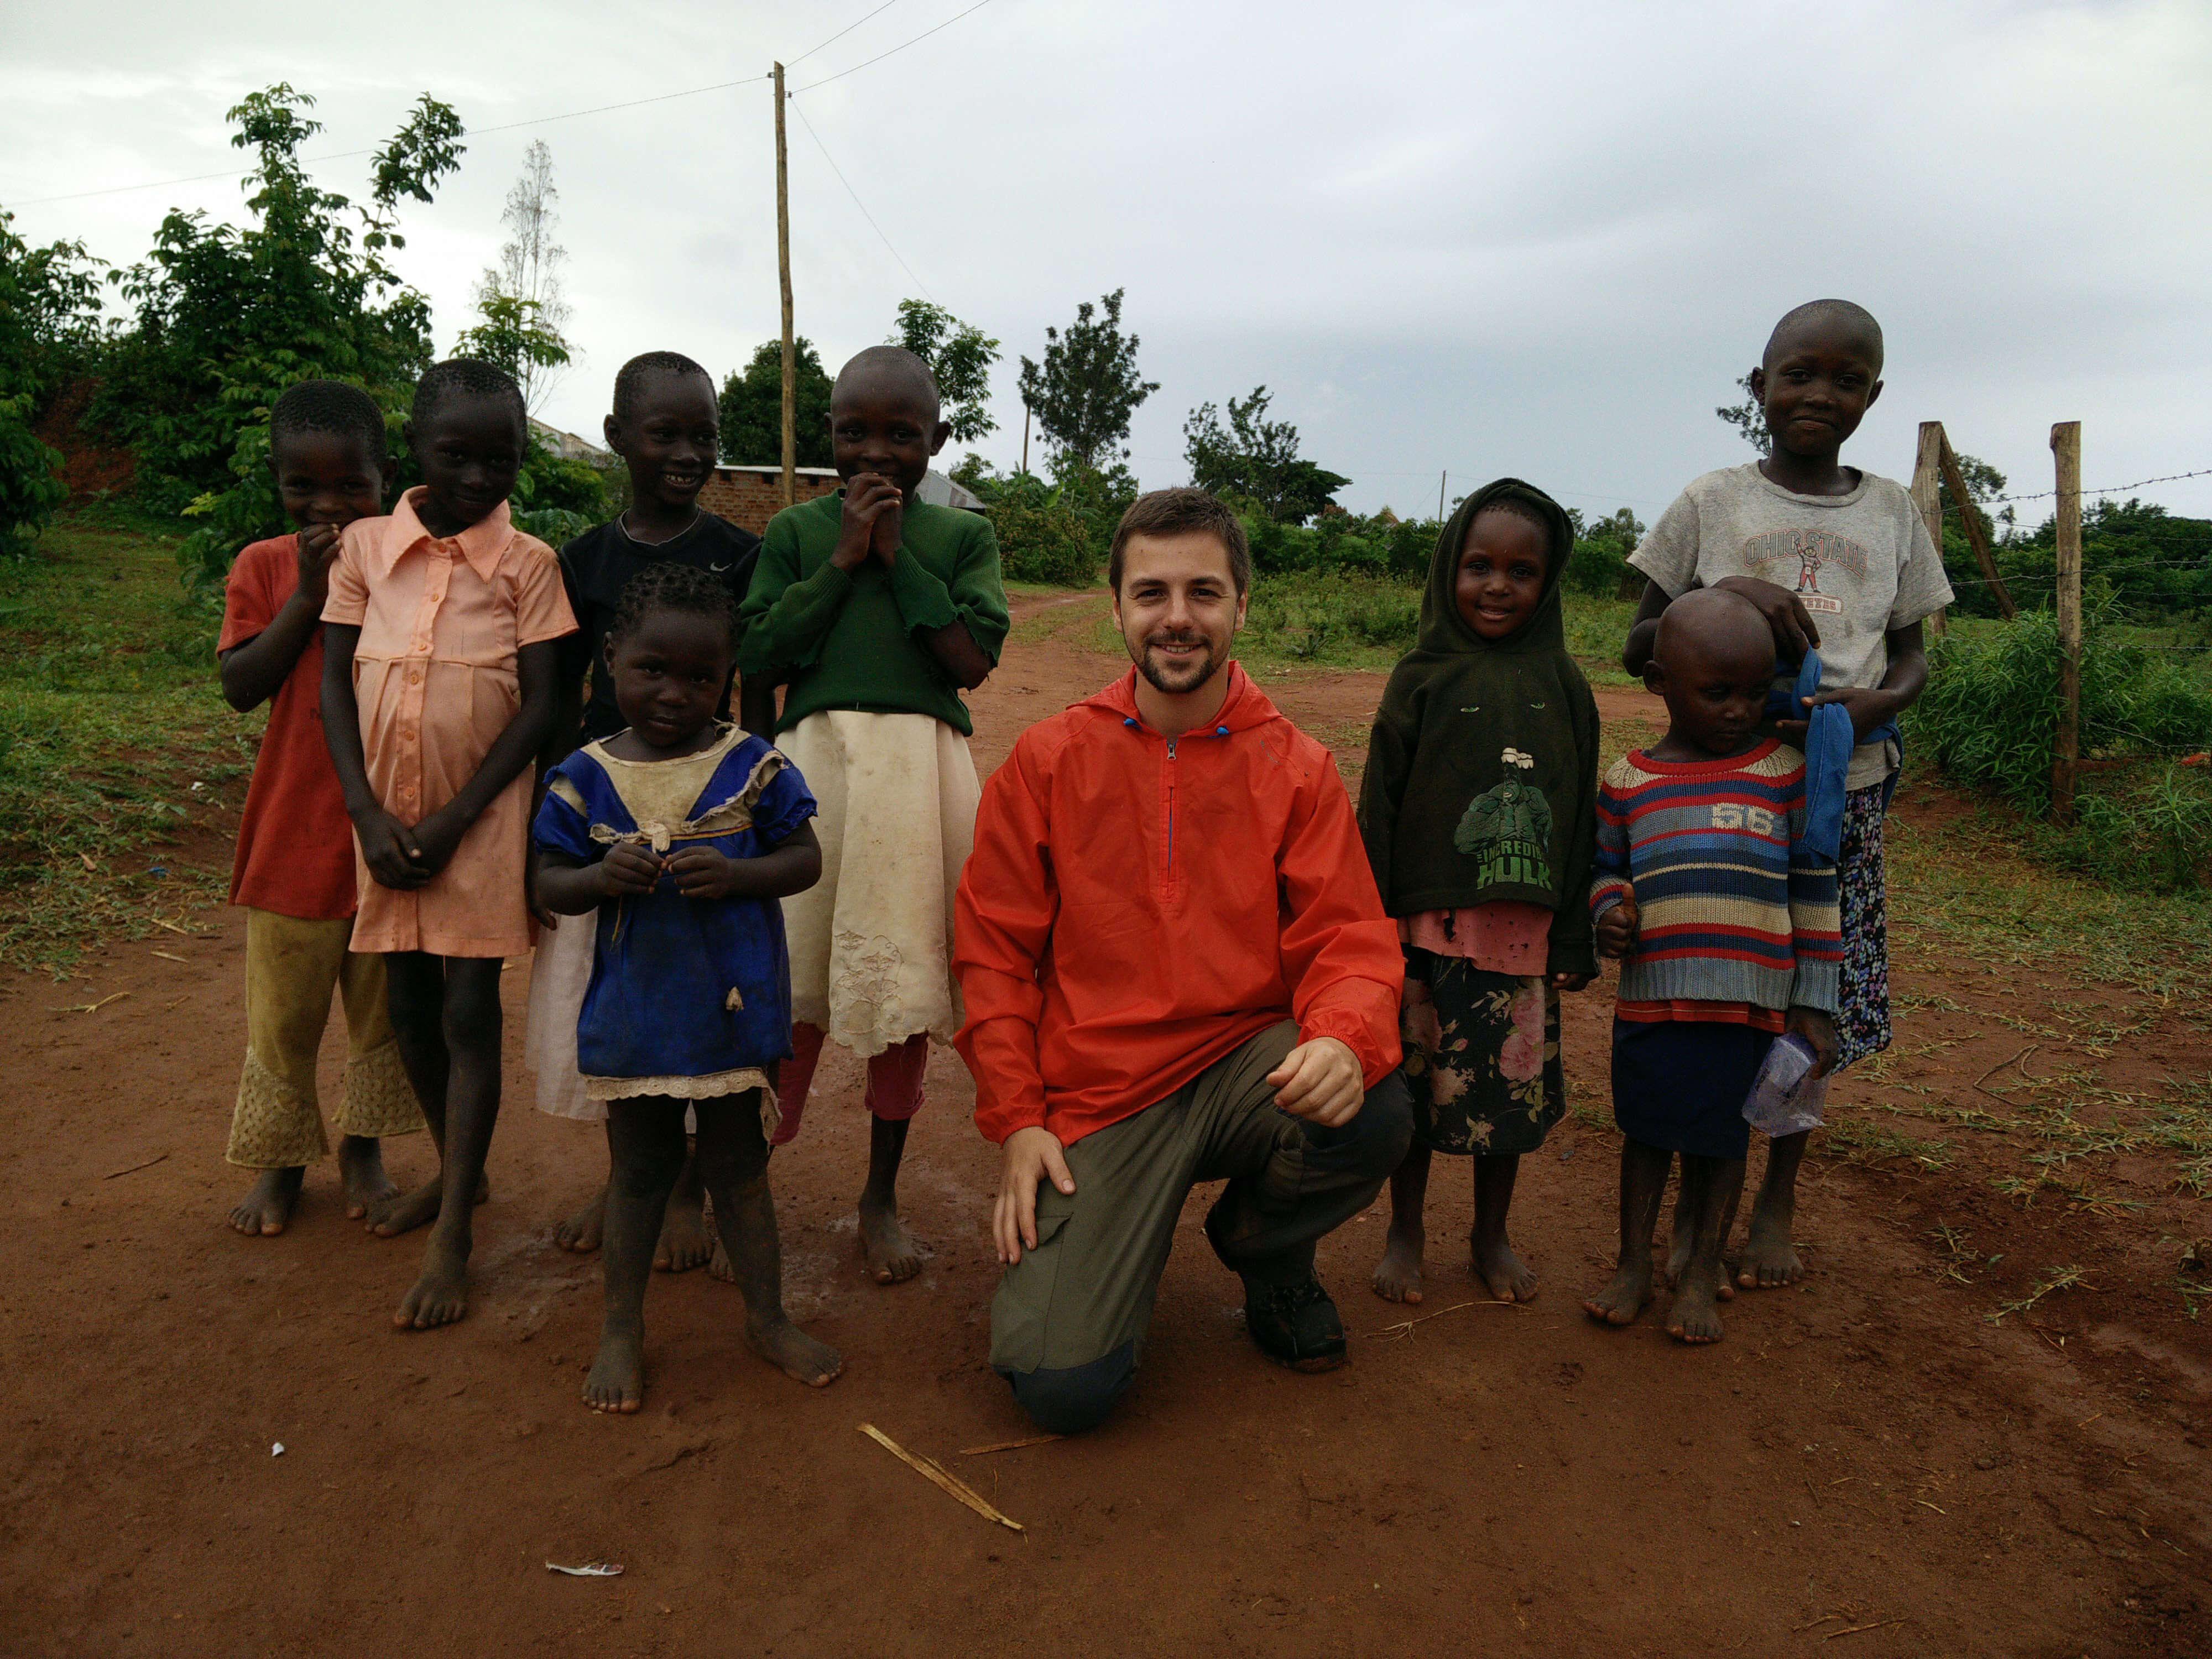 kudura-people-project-solution-energy-power-rural-community-children